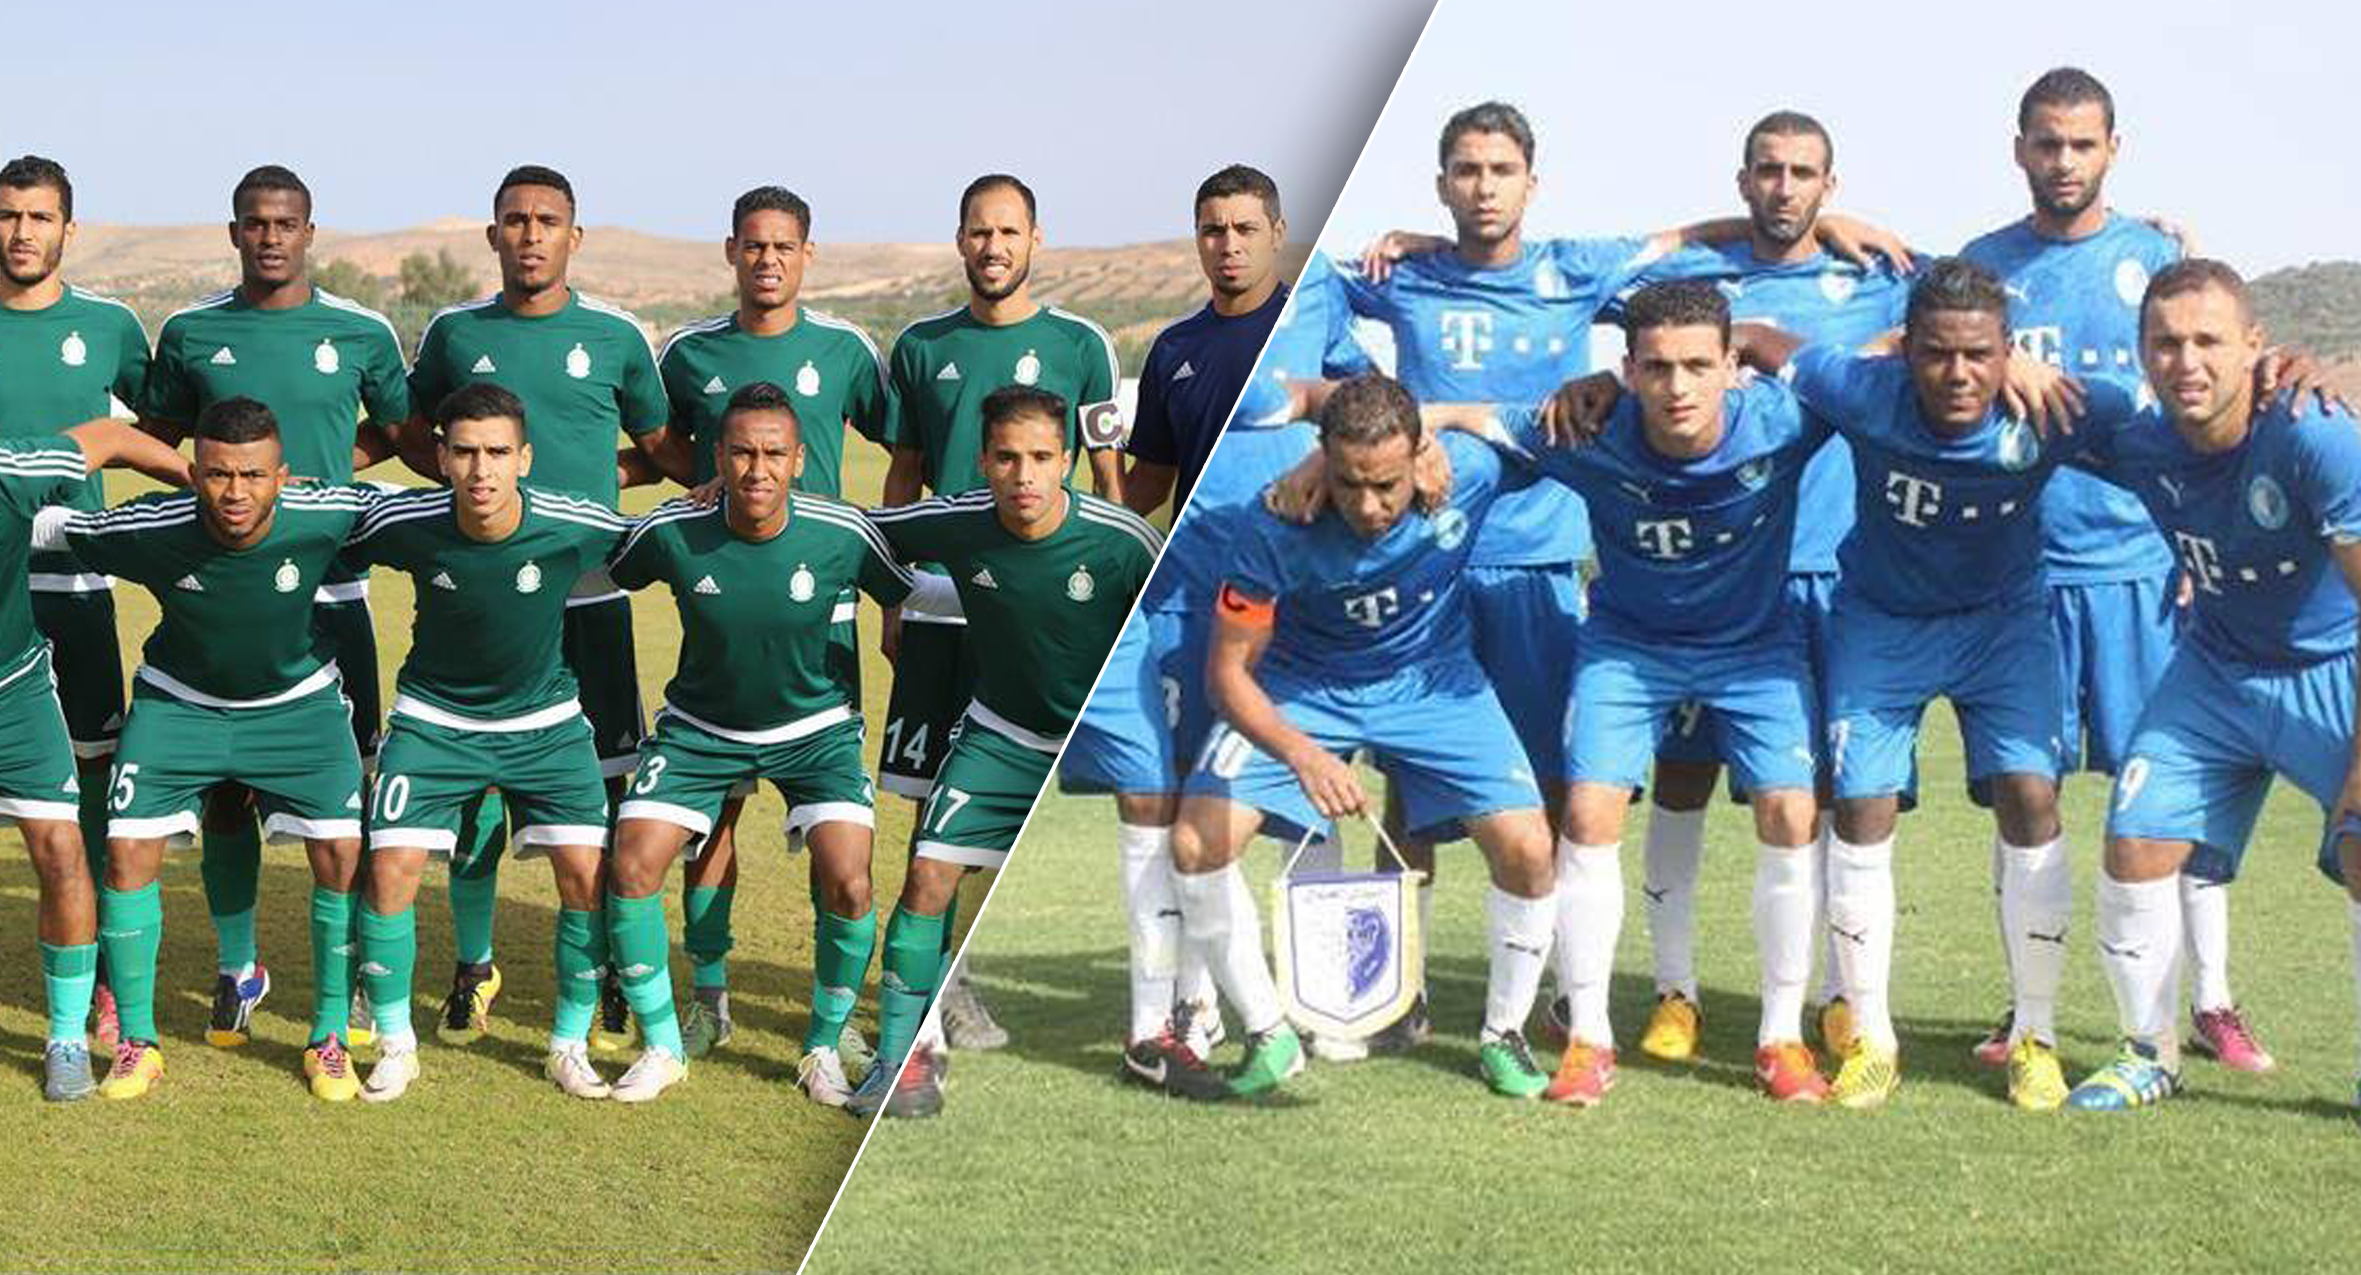 نهائي كأس ليبيا في مصراتة